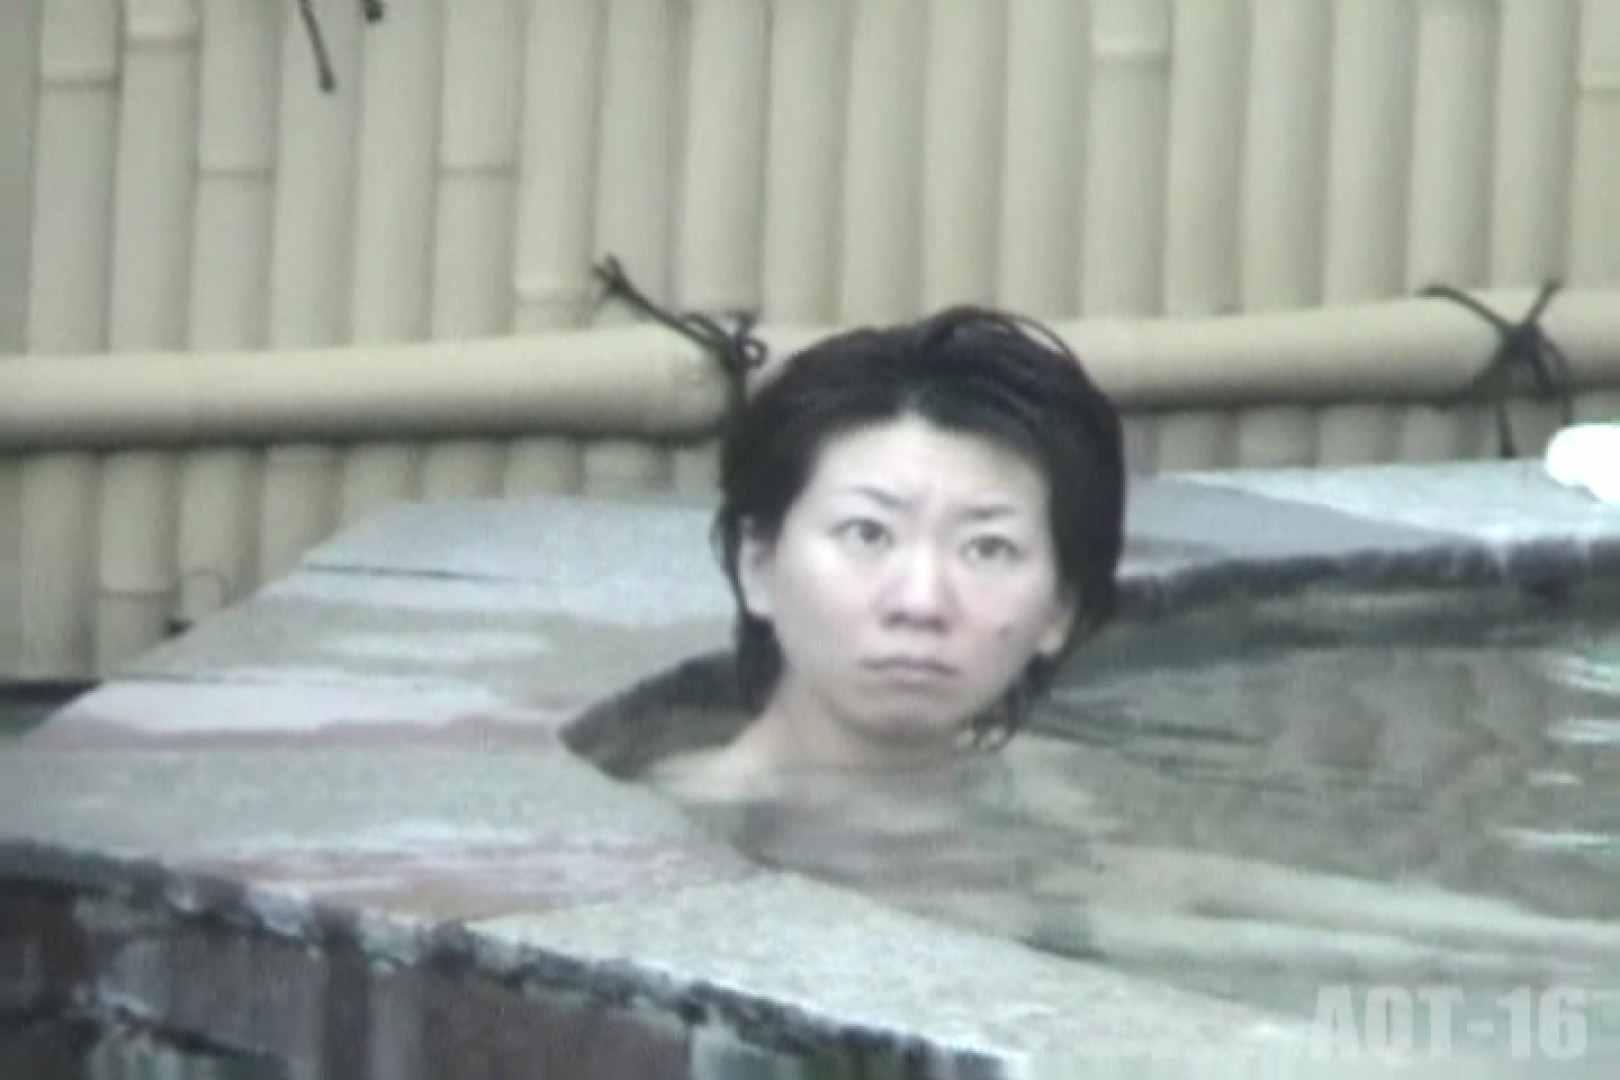 Aquaな露天風呂Vol.842 露天風呂編 | 盗撮シリーズ  82PIX 23